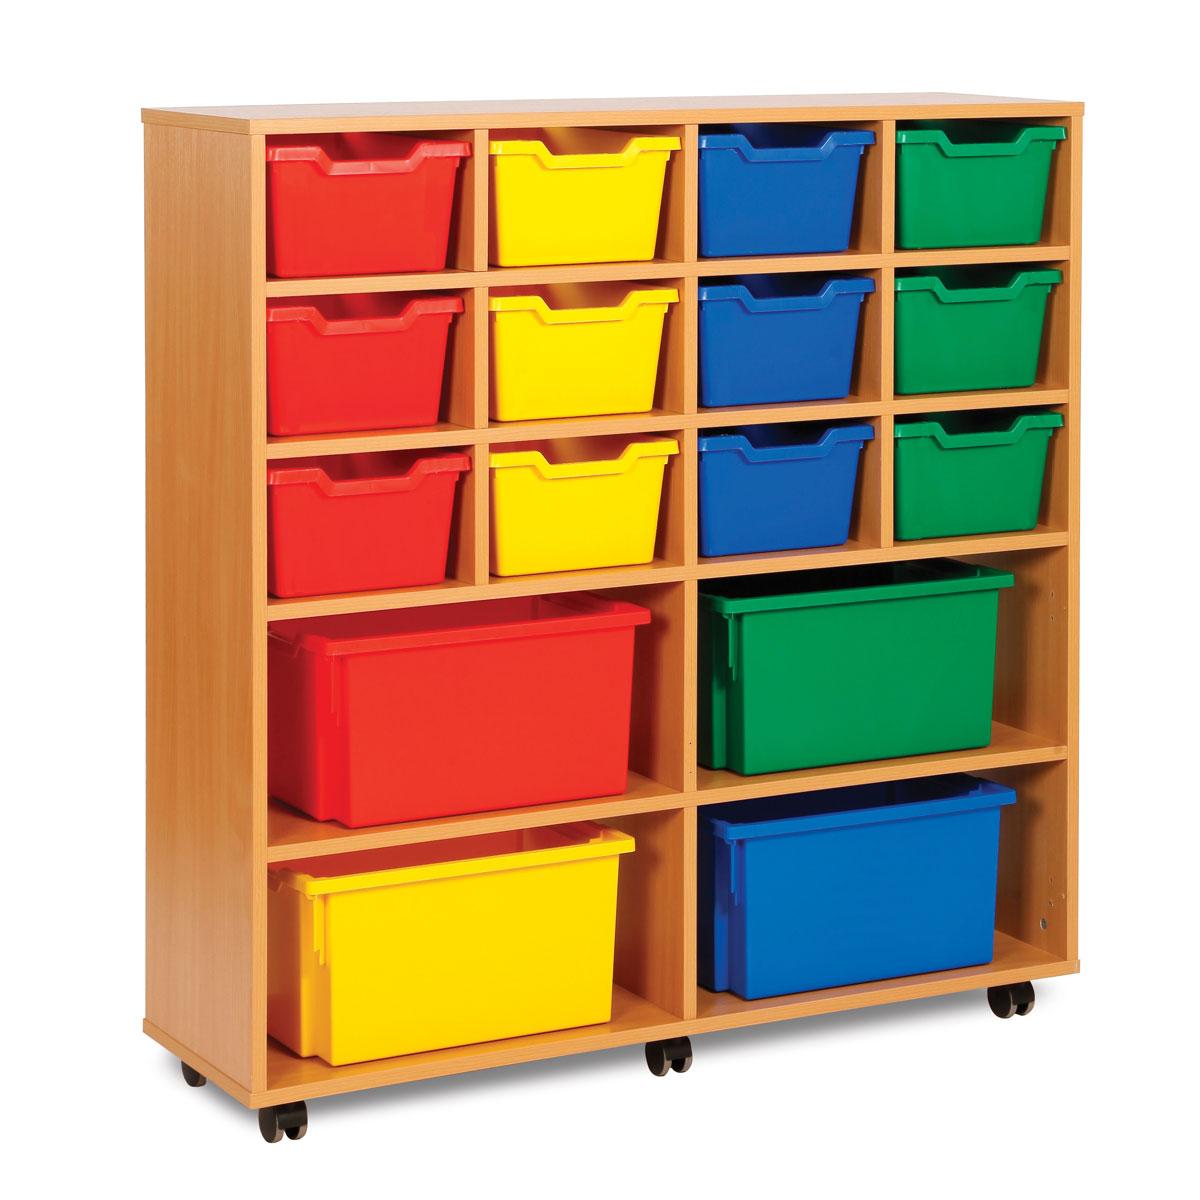 Modular Classroom Crossword : Cubby tray storage unit with extra deep trays meq